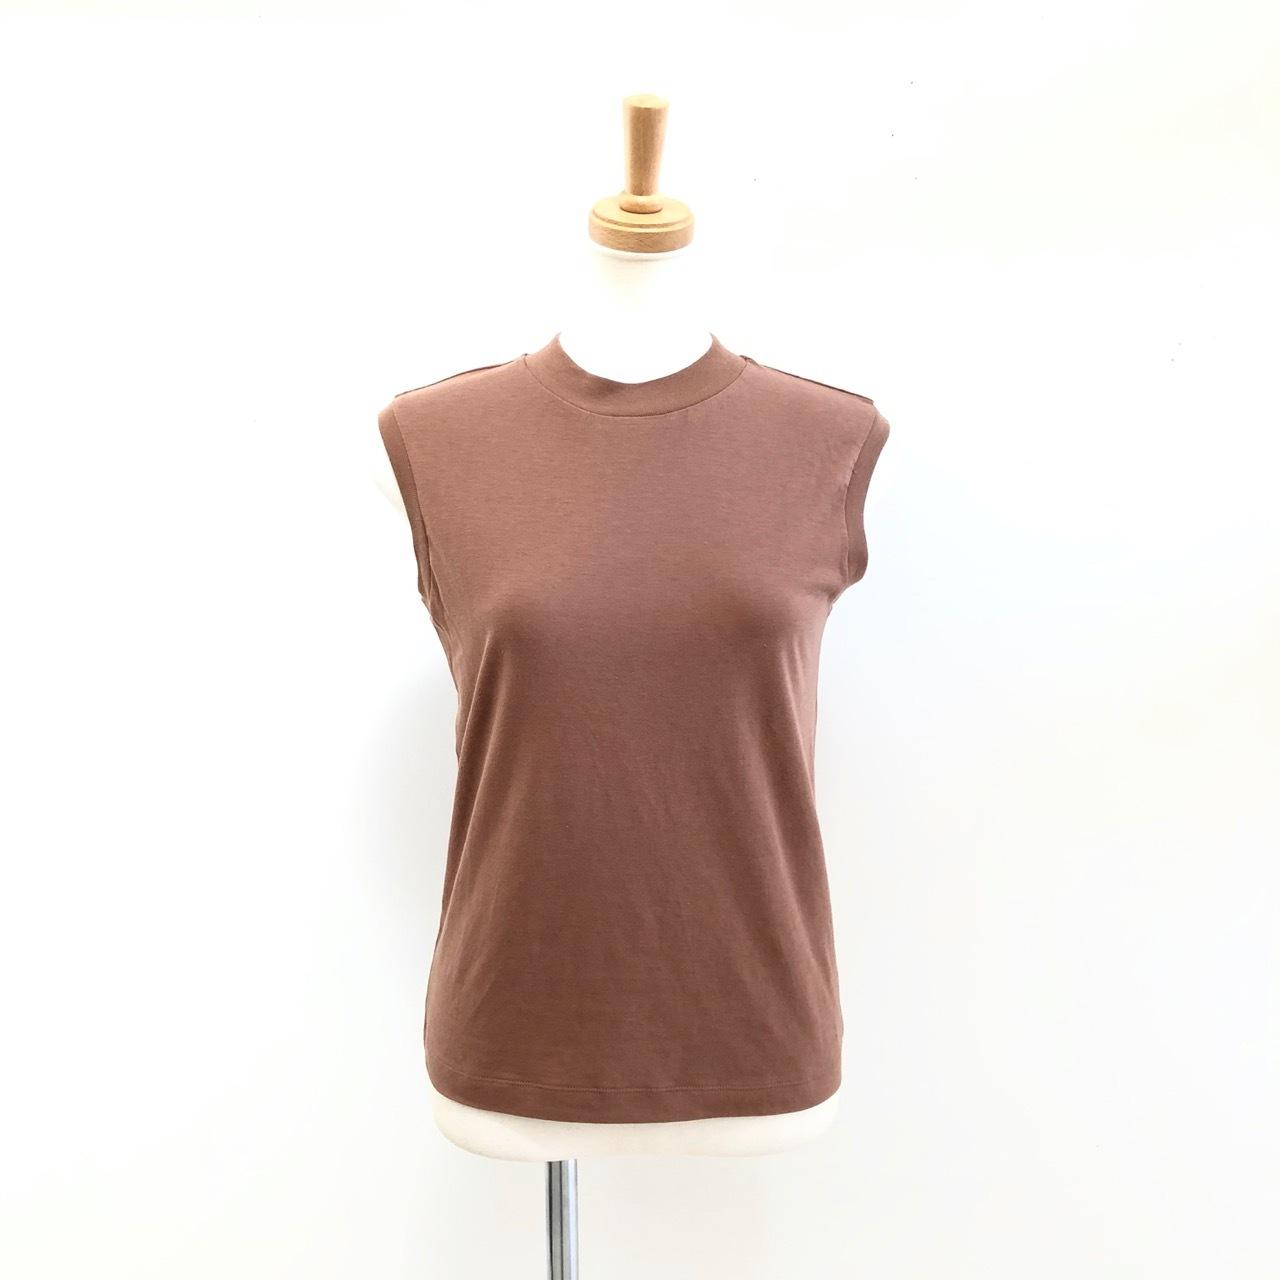 【 luvourdays 】- PB204 - ノースリーブTシャツ